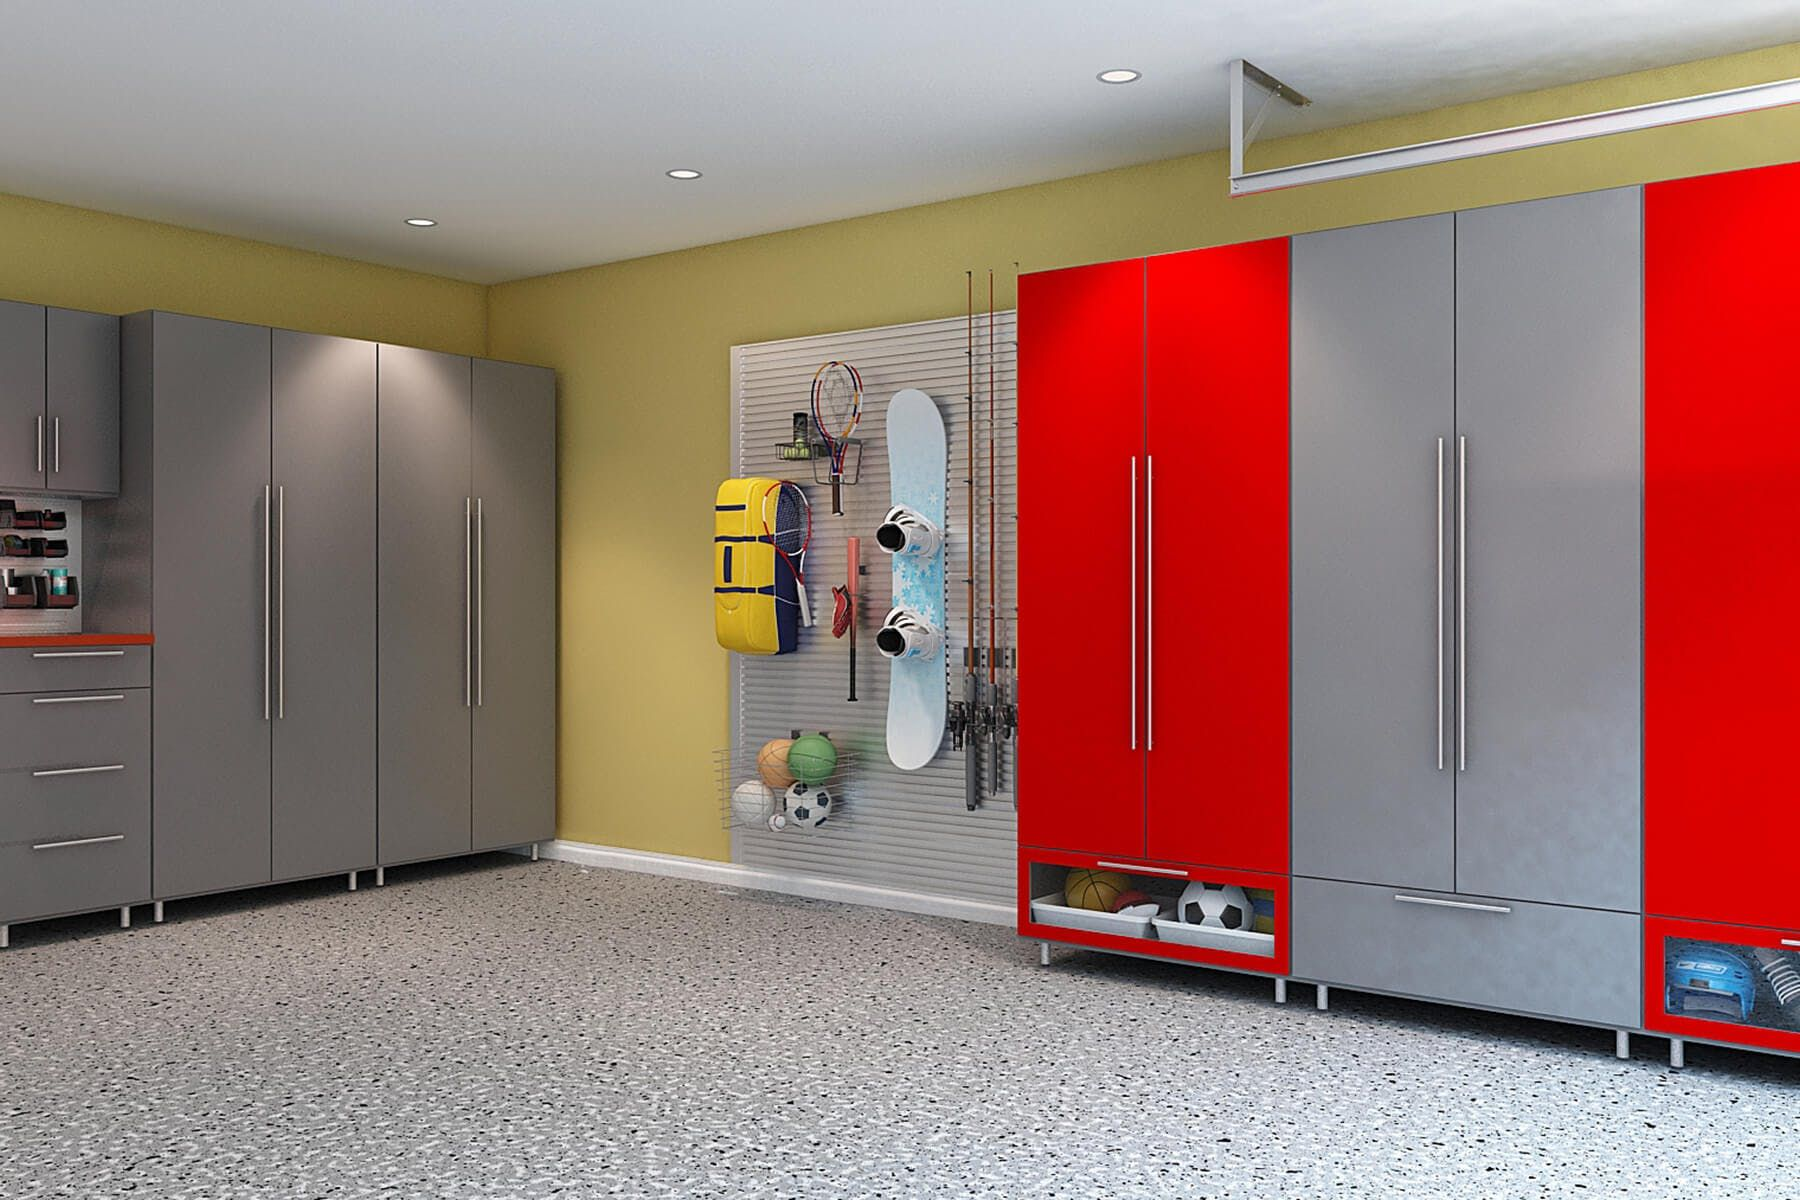 #custom #cabinetry #garage #mancave #storage #style #interiordesign #design